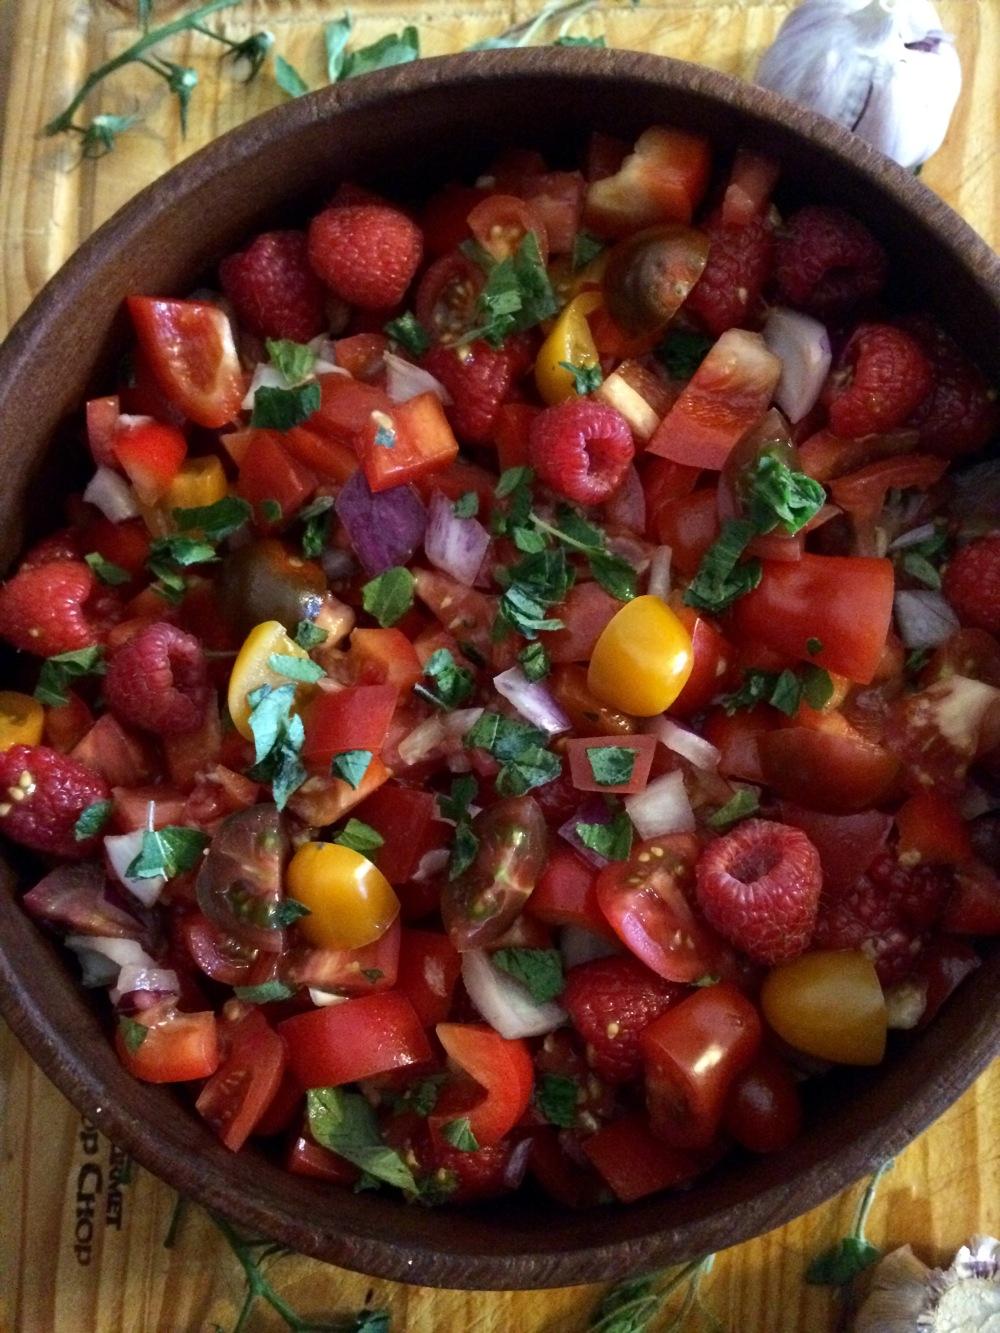 raspberry salad 2